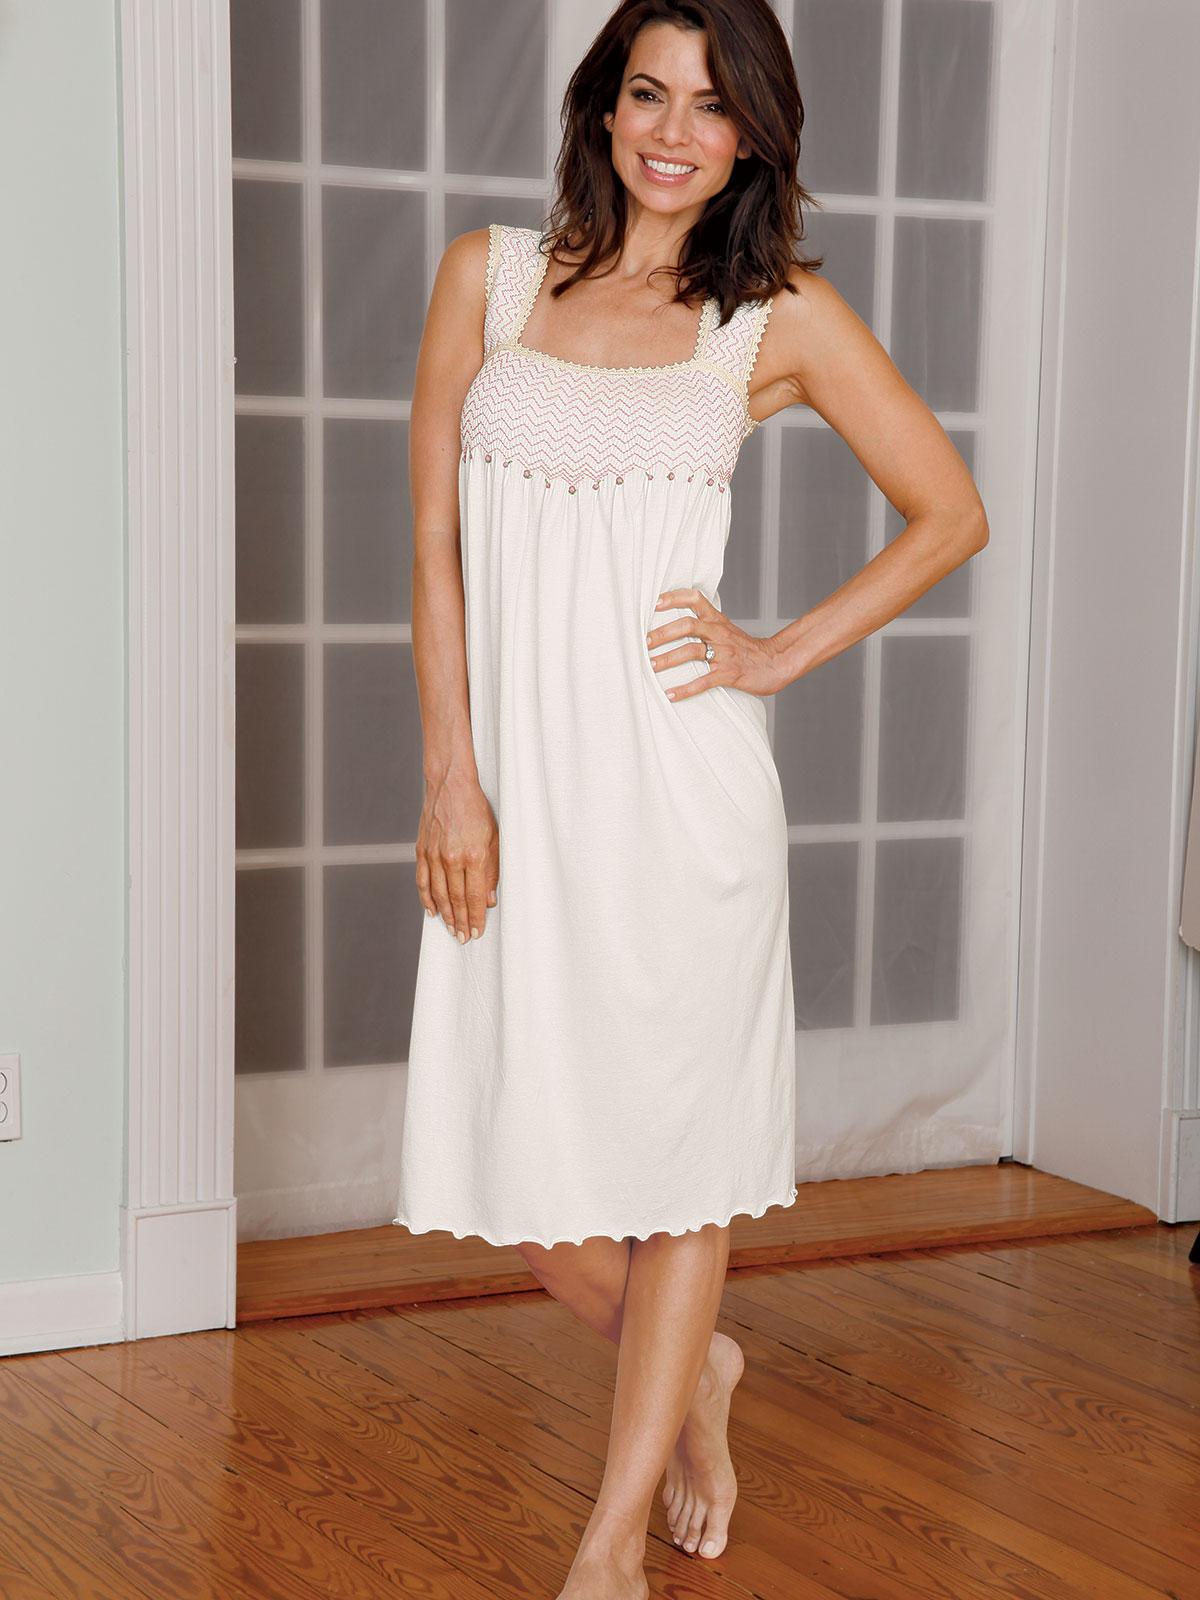 Delicia Luxury Nightwear Schweitzer Linen